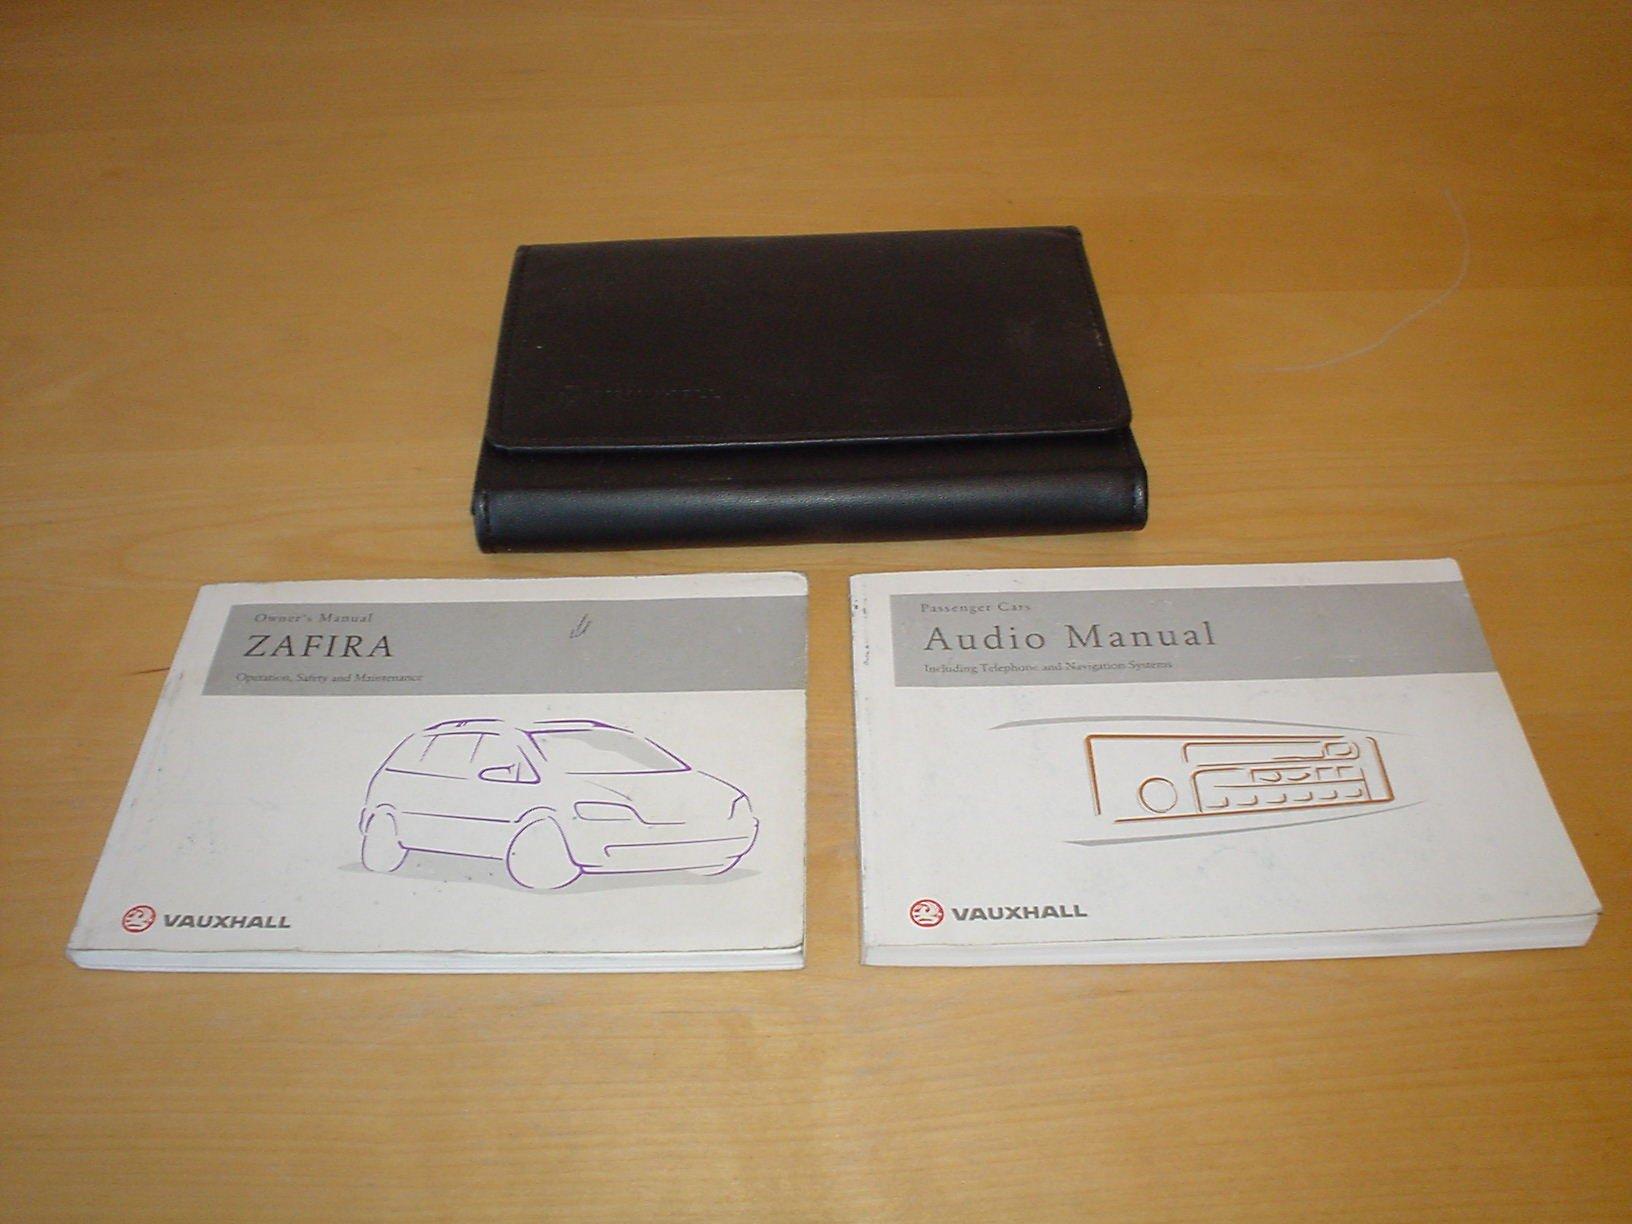 vauxhall opel zafira a owners manual handbook 1999 2005 1 6 rh amazon co uk 2002 zafira owners manual pdf zafira 2002 owners manual